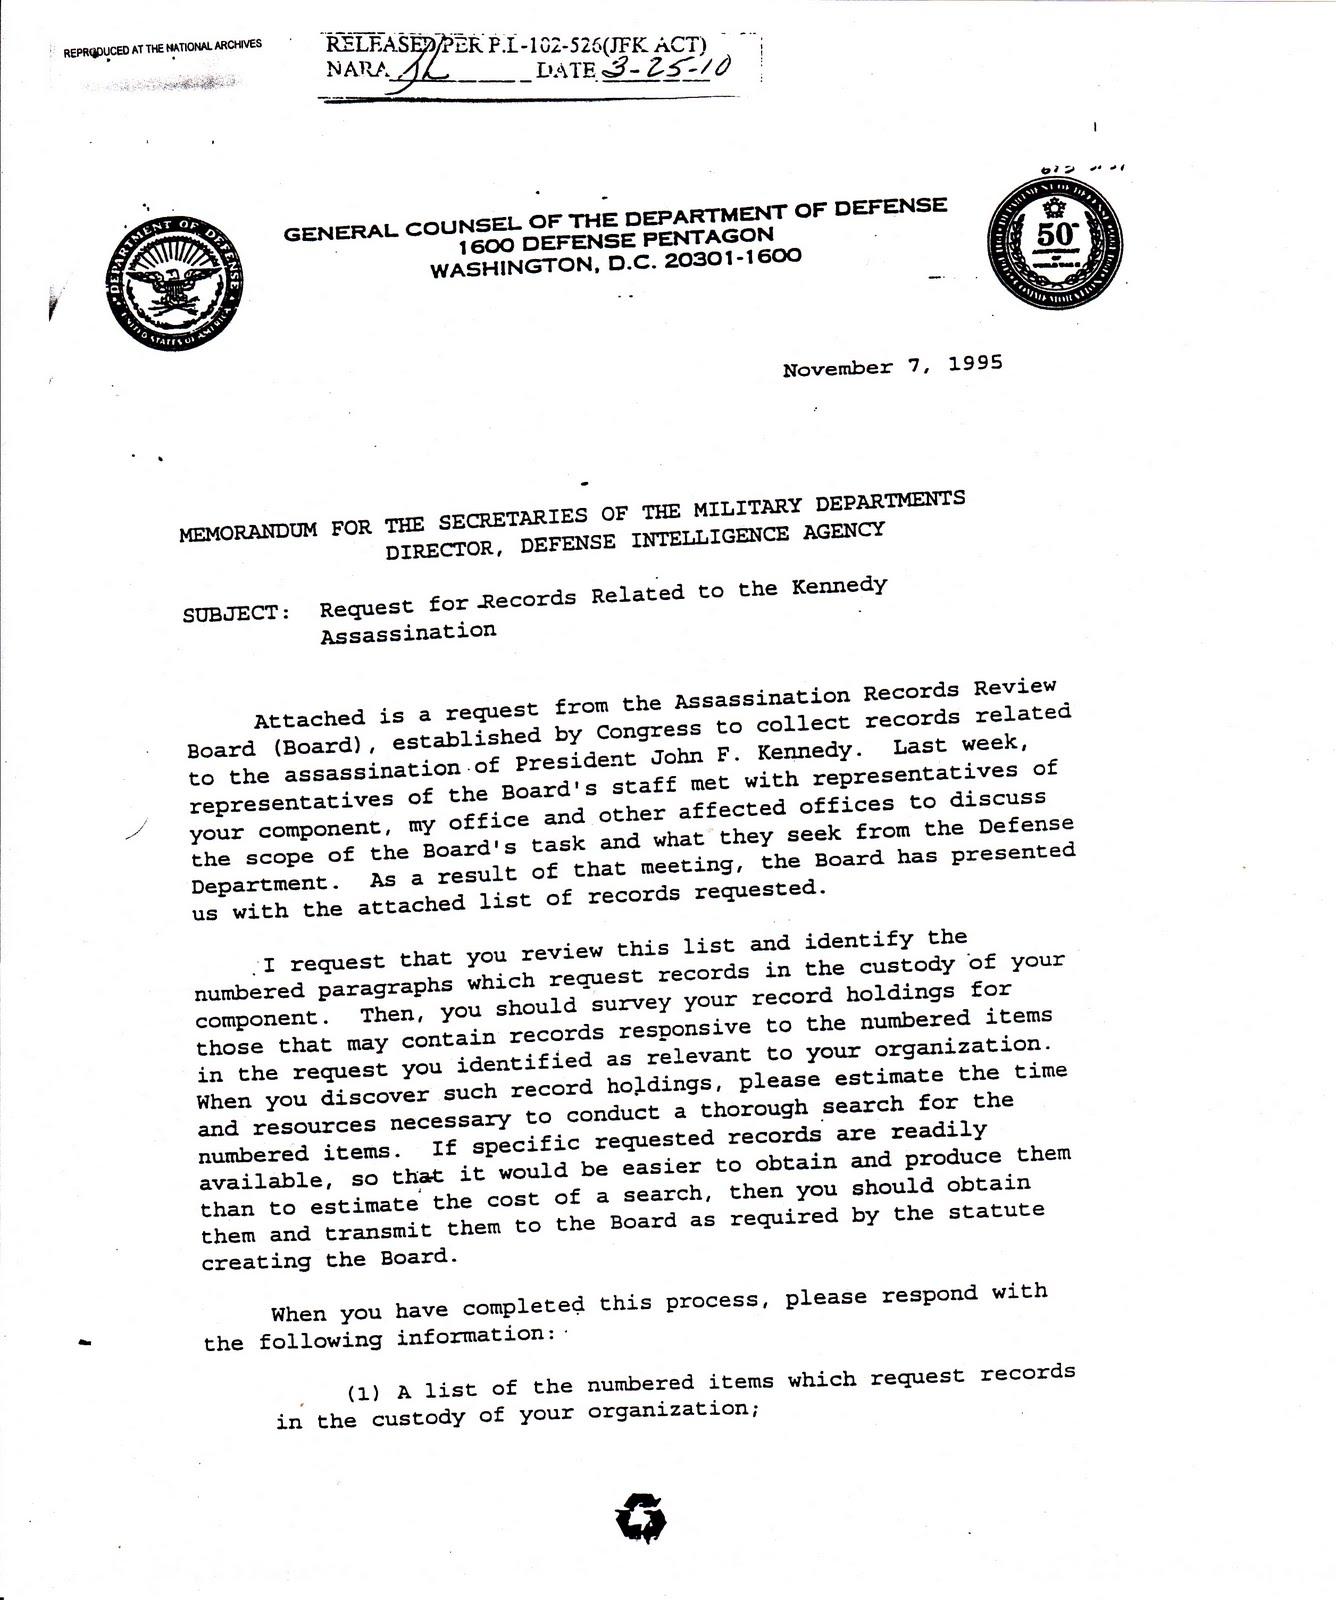 dod memo template - jfkcountercoup nov 7 1995 memo for secretaries of the